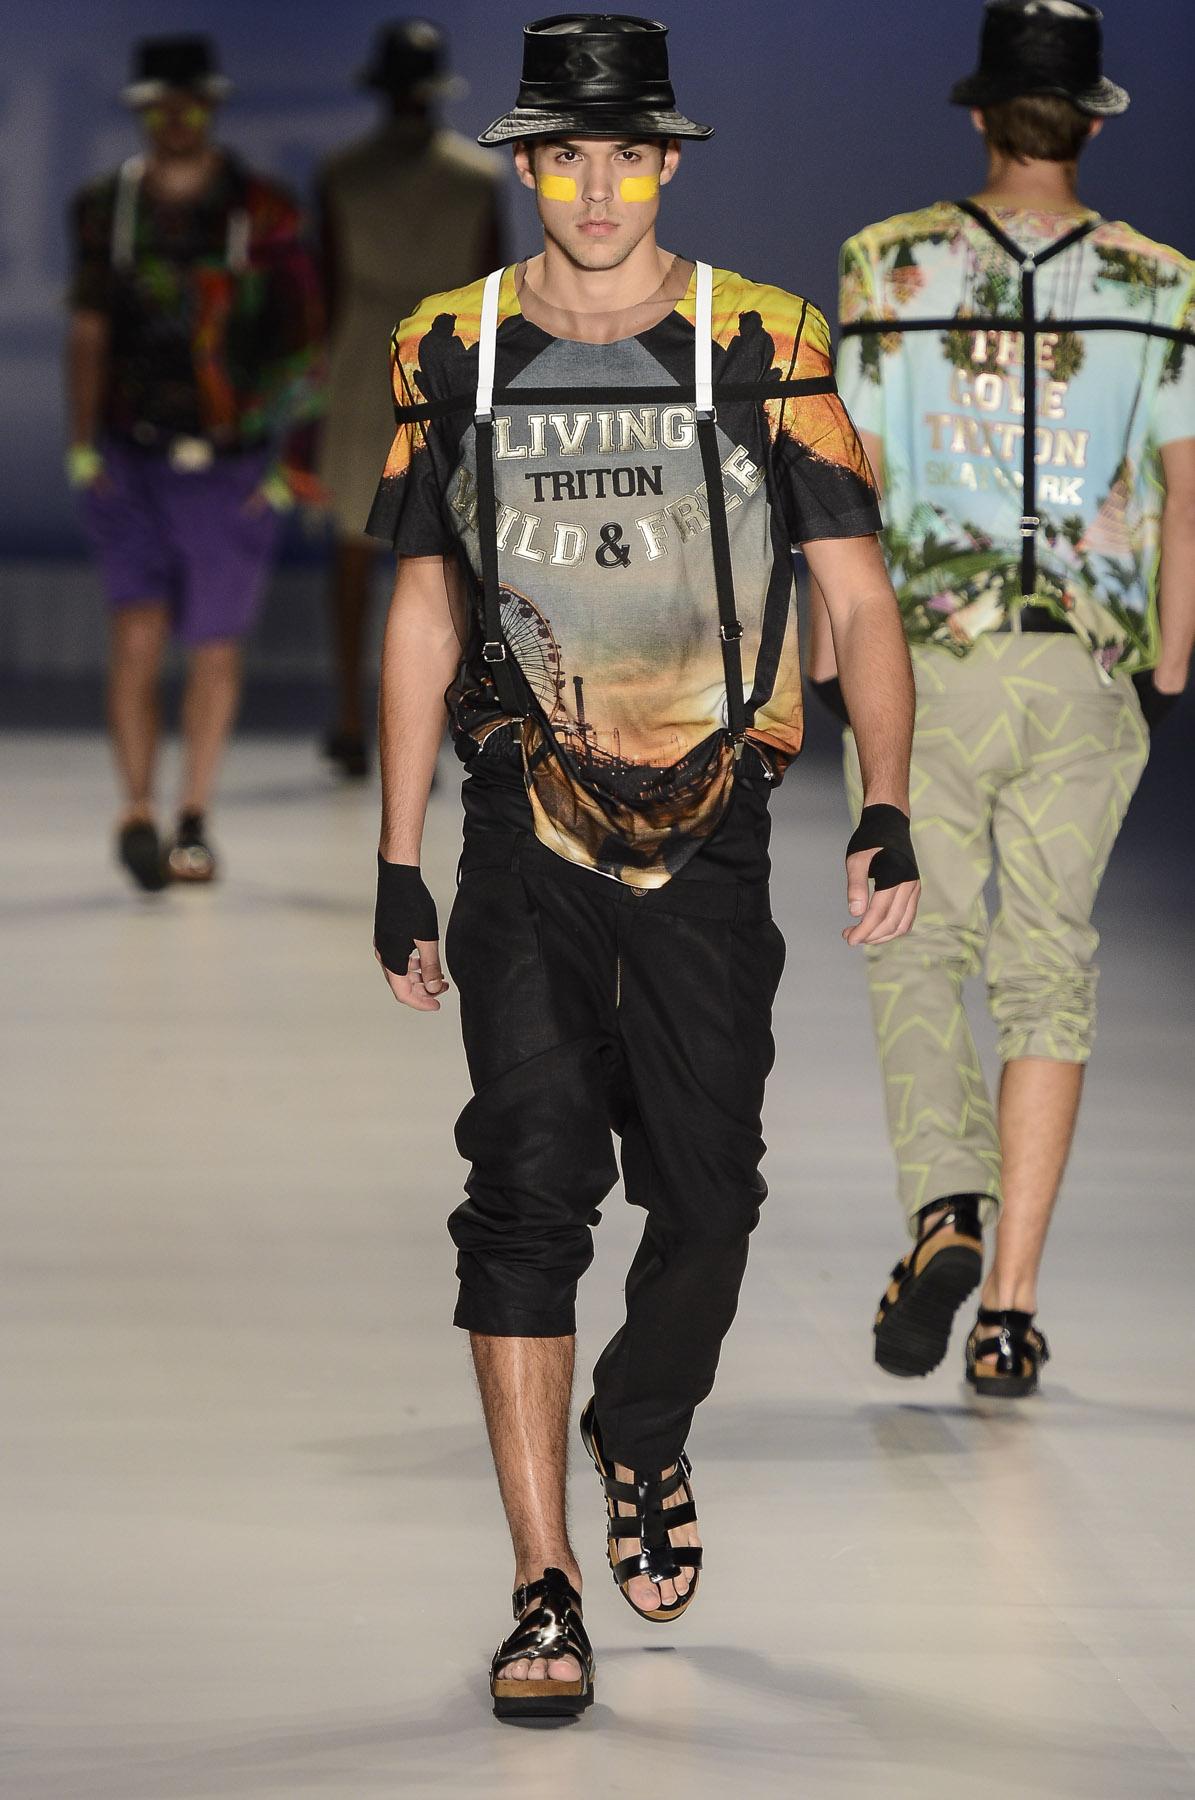 Sao Paulo Fashion Week S/S 2014: Triton